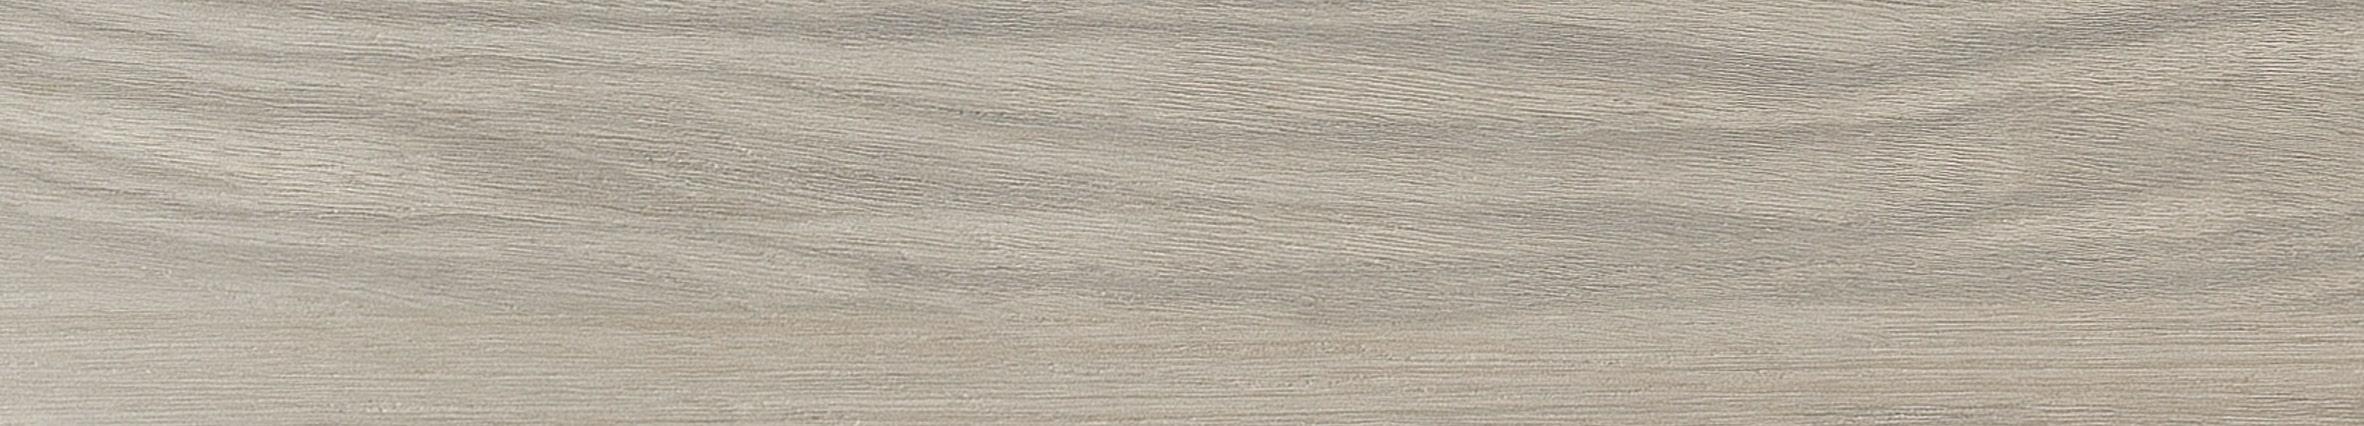 Wooden Tile / Wooden Gray Slate-Hammered 10mm 20 x 120